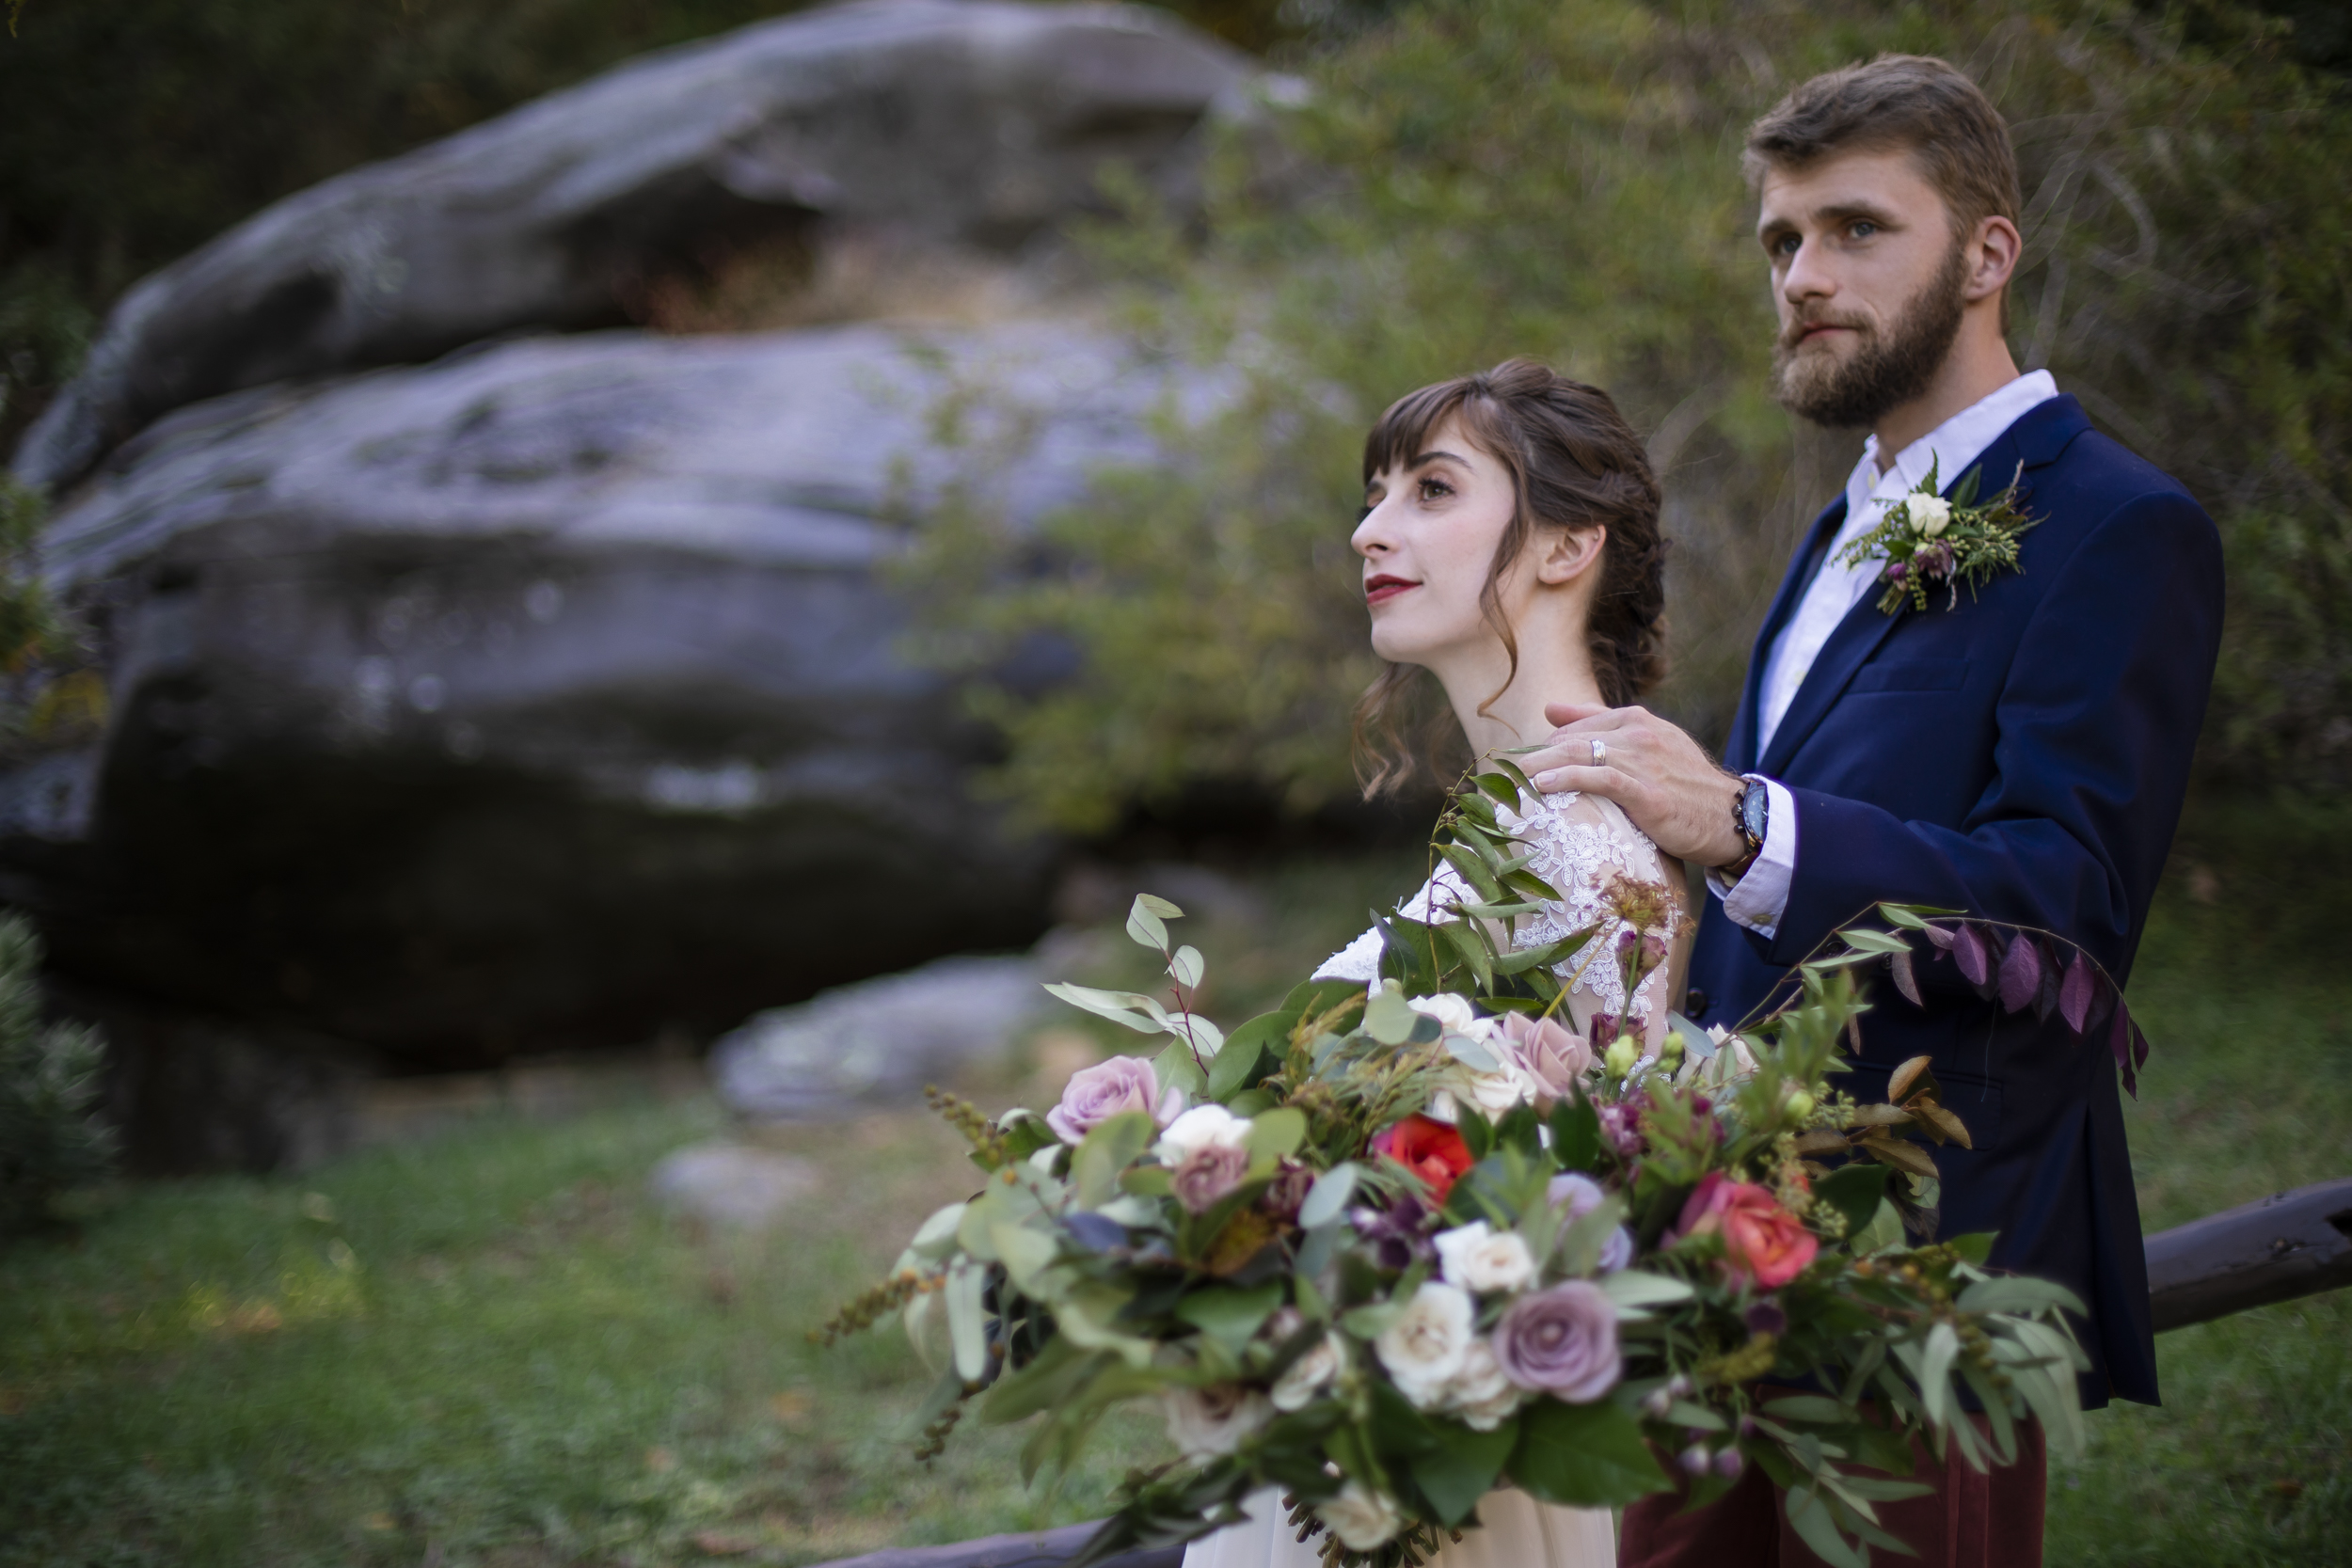 Laurel Falls Wedding October 2018_Allison and Josh__Lola Salon_Flora_Photo by Studio Misha Photography-65.jpg